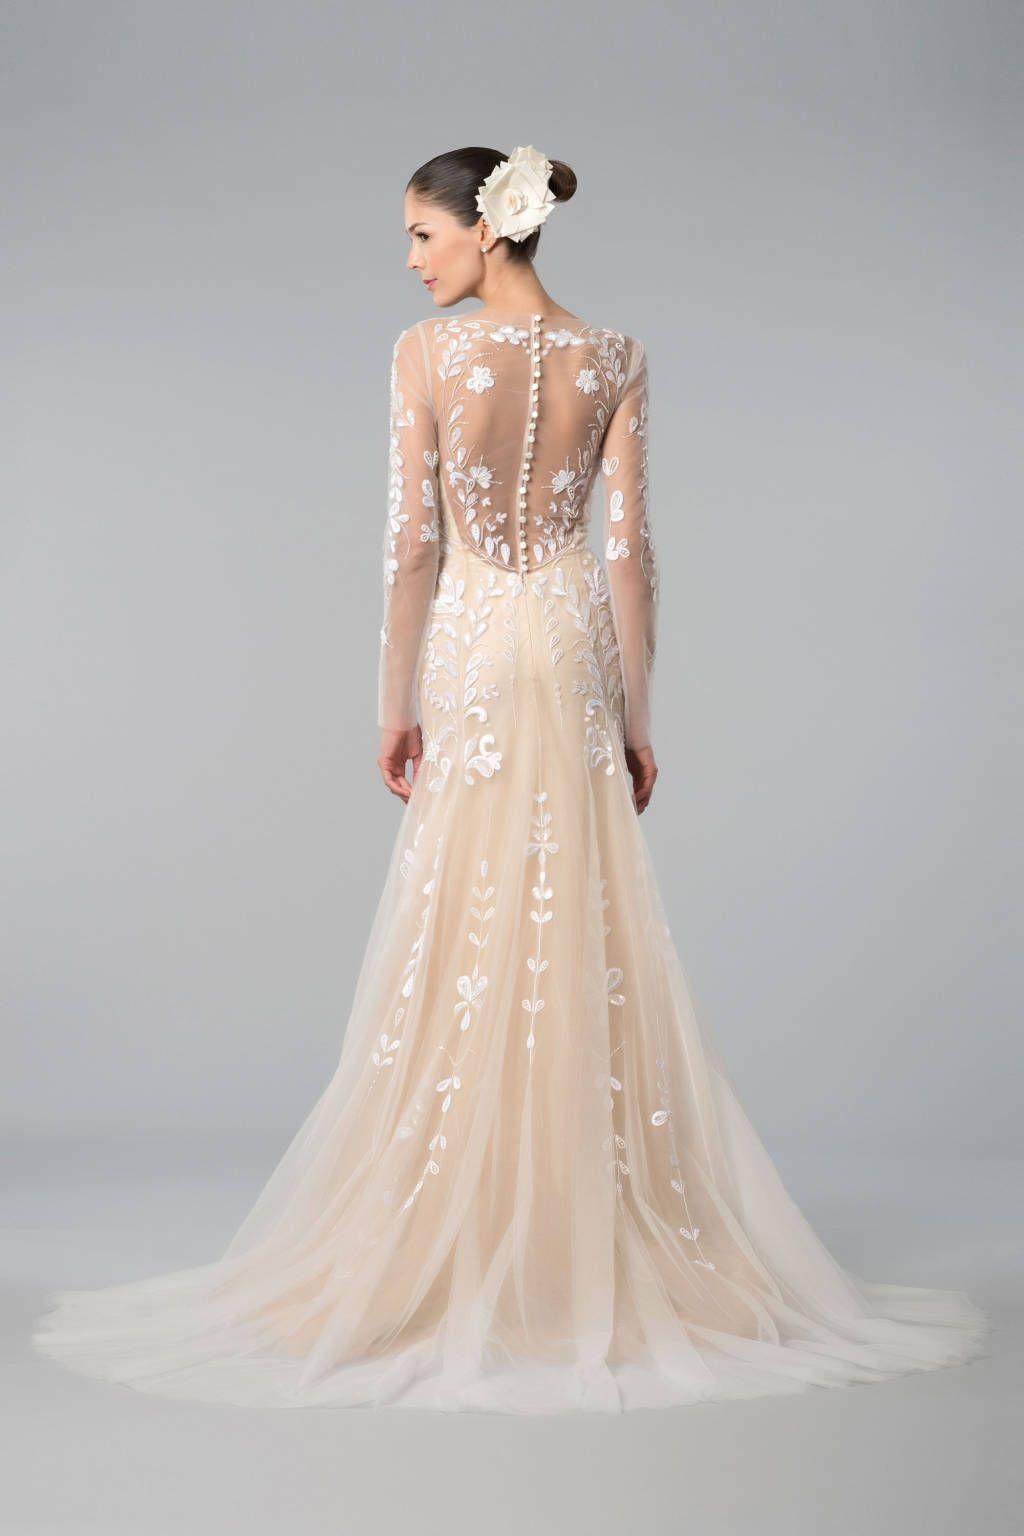 Rose colored wedding dress  Best in Fall  Bridal Lela Rose  Carolina herrera Wedding